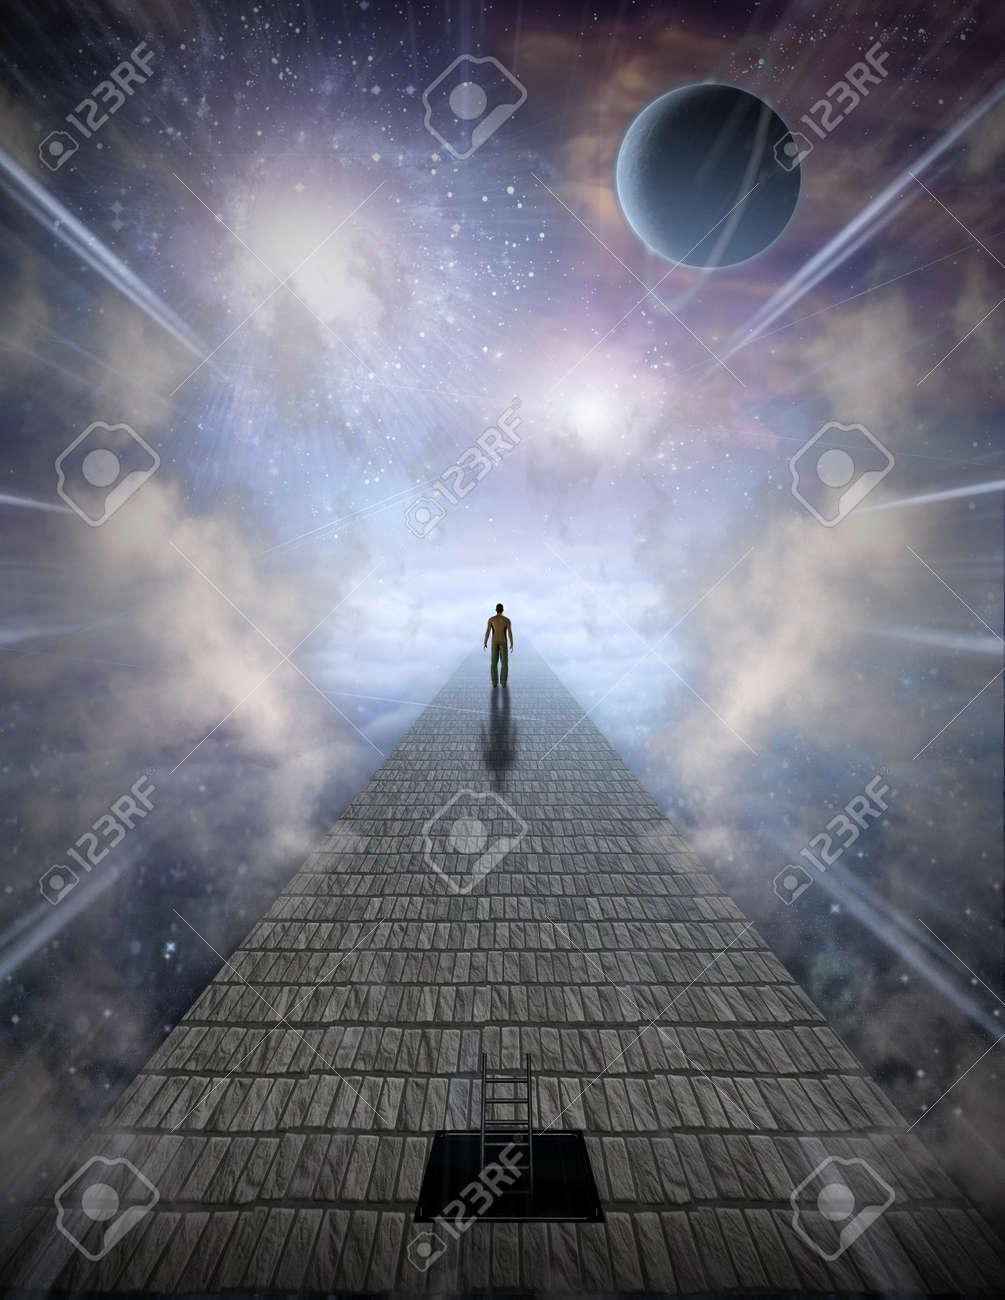 Art galleries of spiritual surrealism and modern mystical exhibition